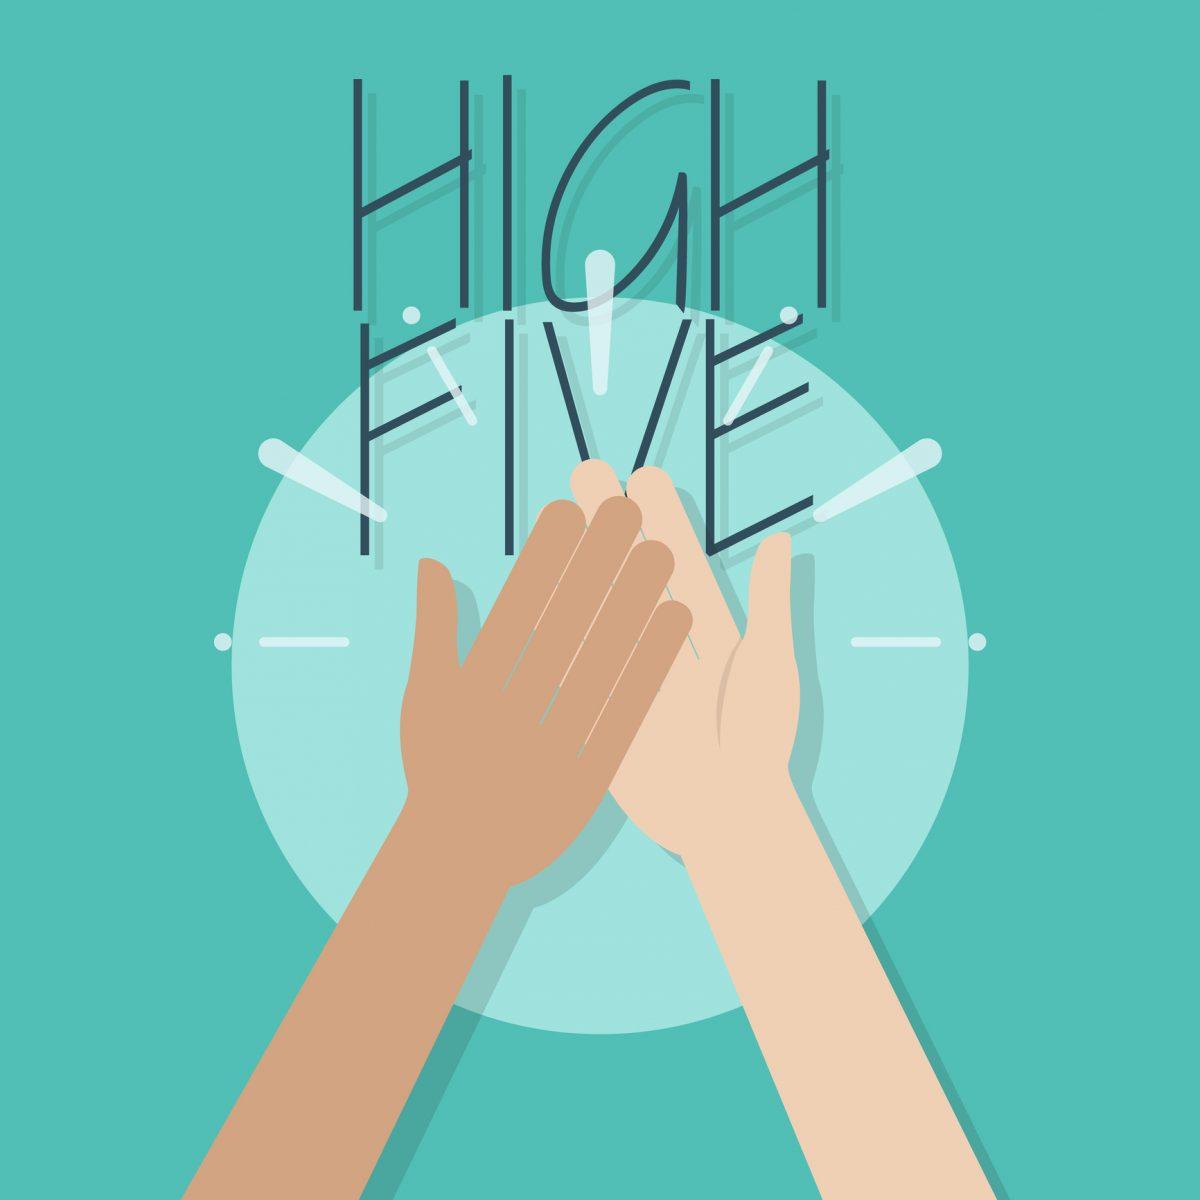 high-five-image